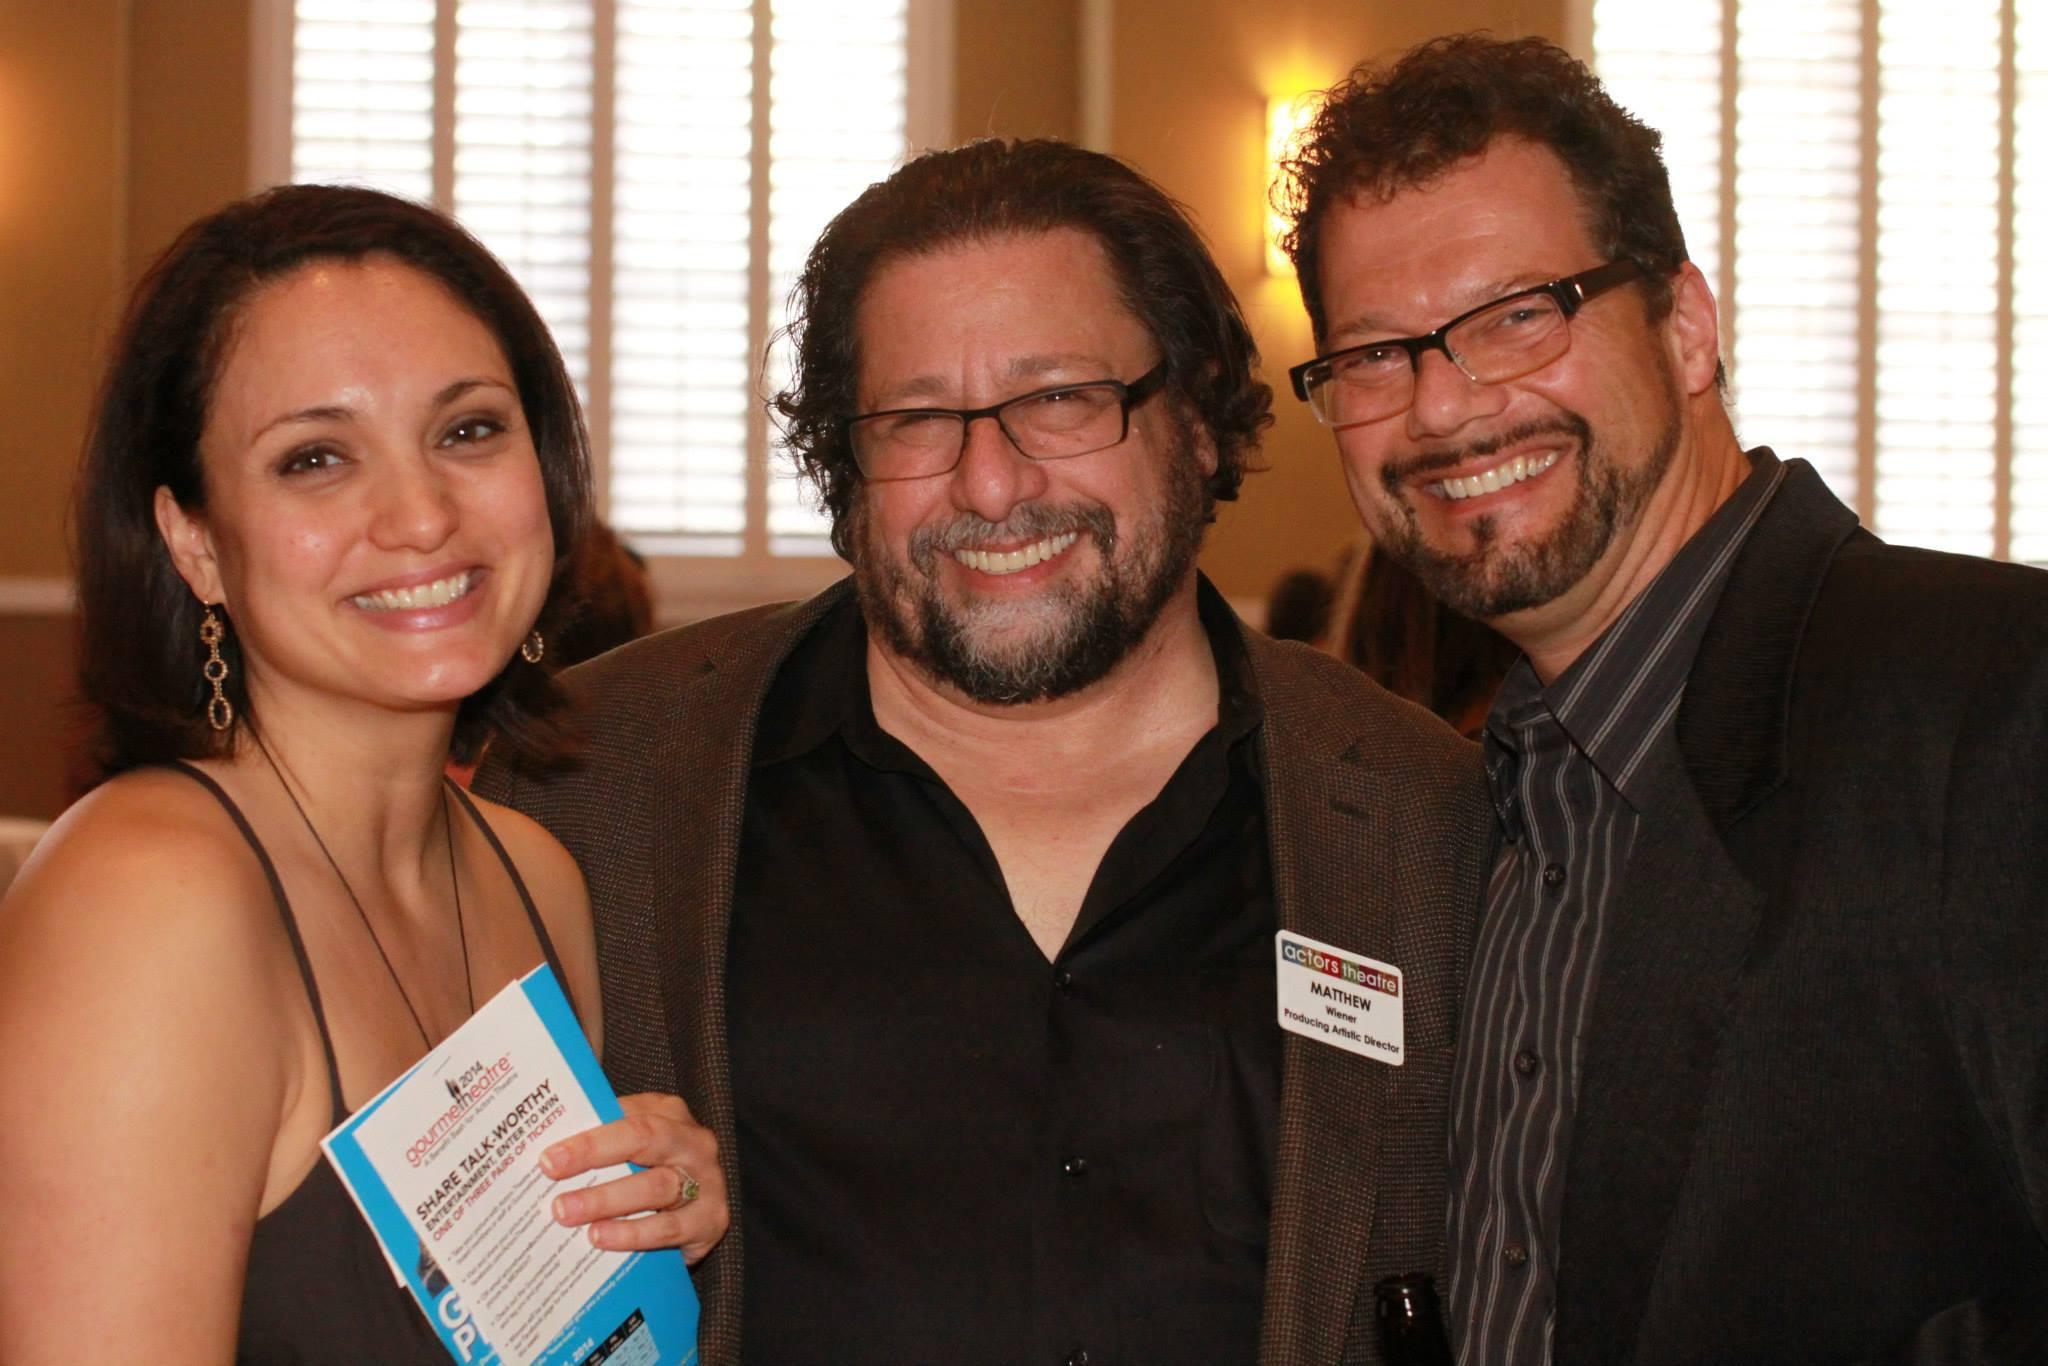 Angelica Howland, Matthew Wiener, Gene Ganssle (Photo by Actors Theatre)